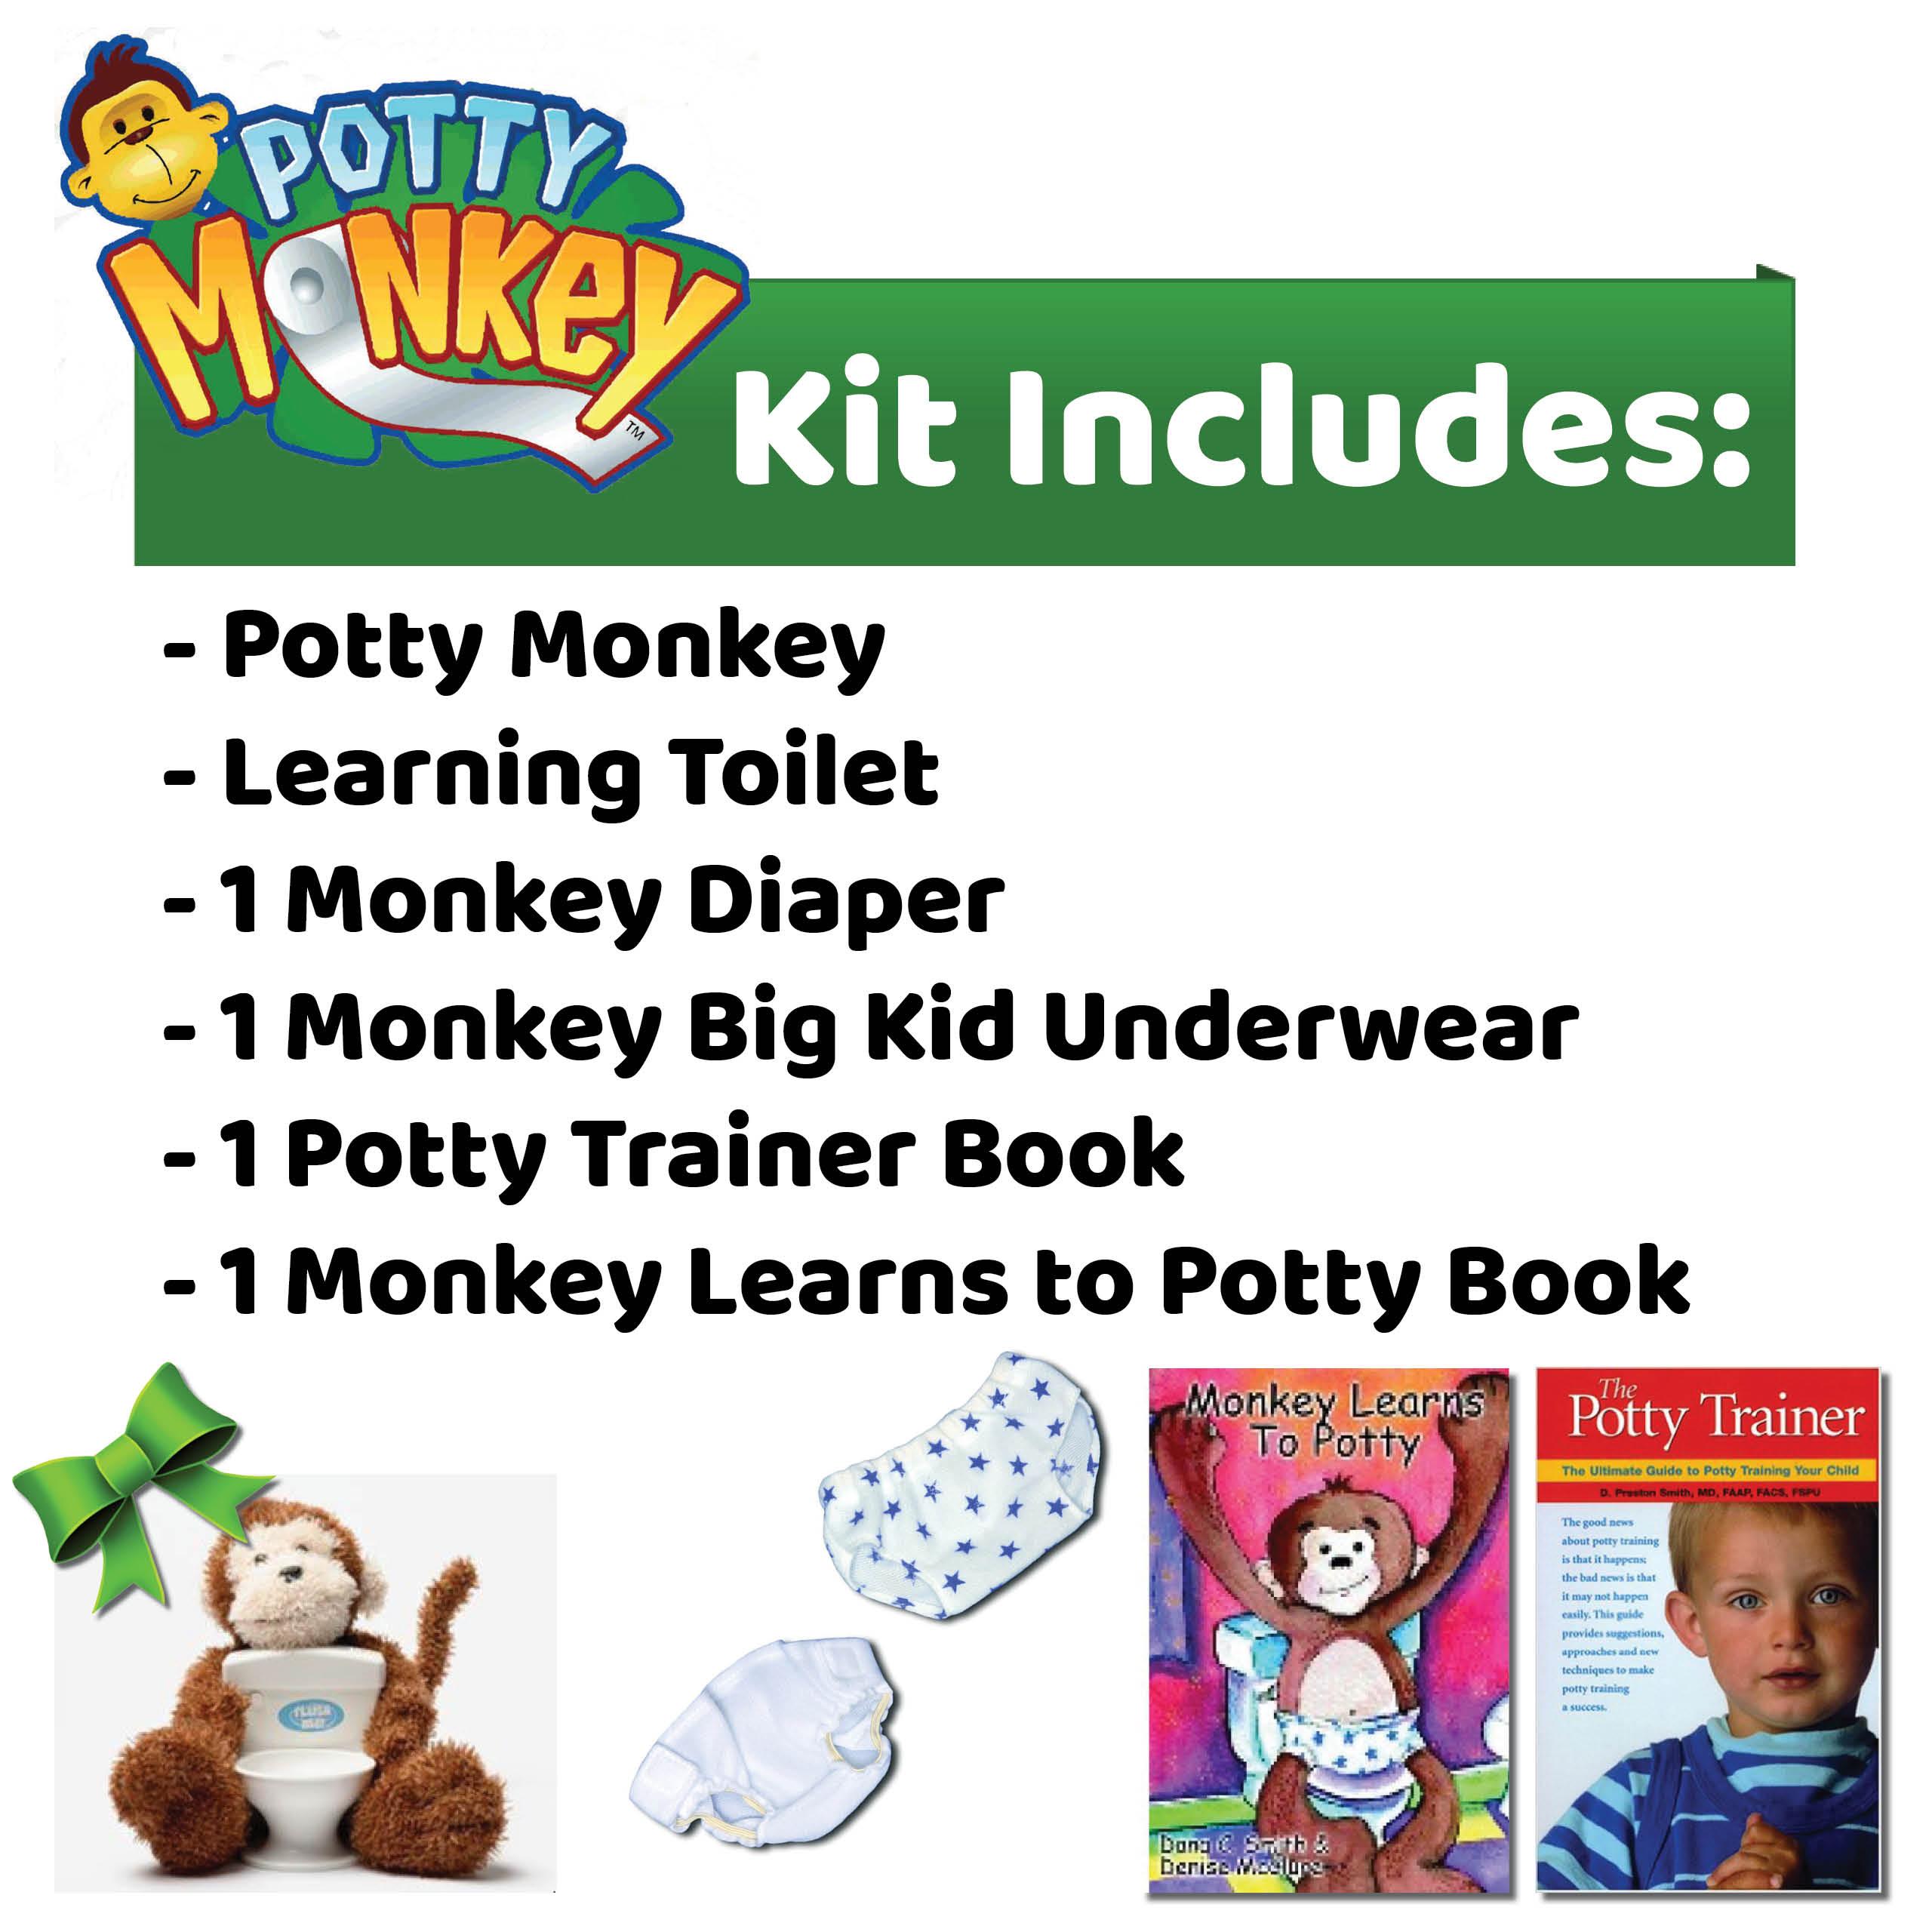 potty-monkey-kit-contents-amazon.jpg